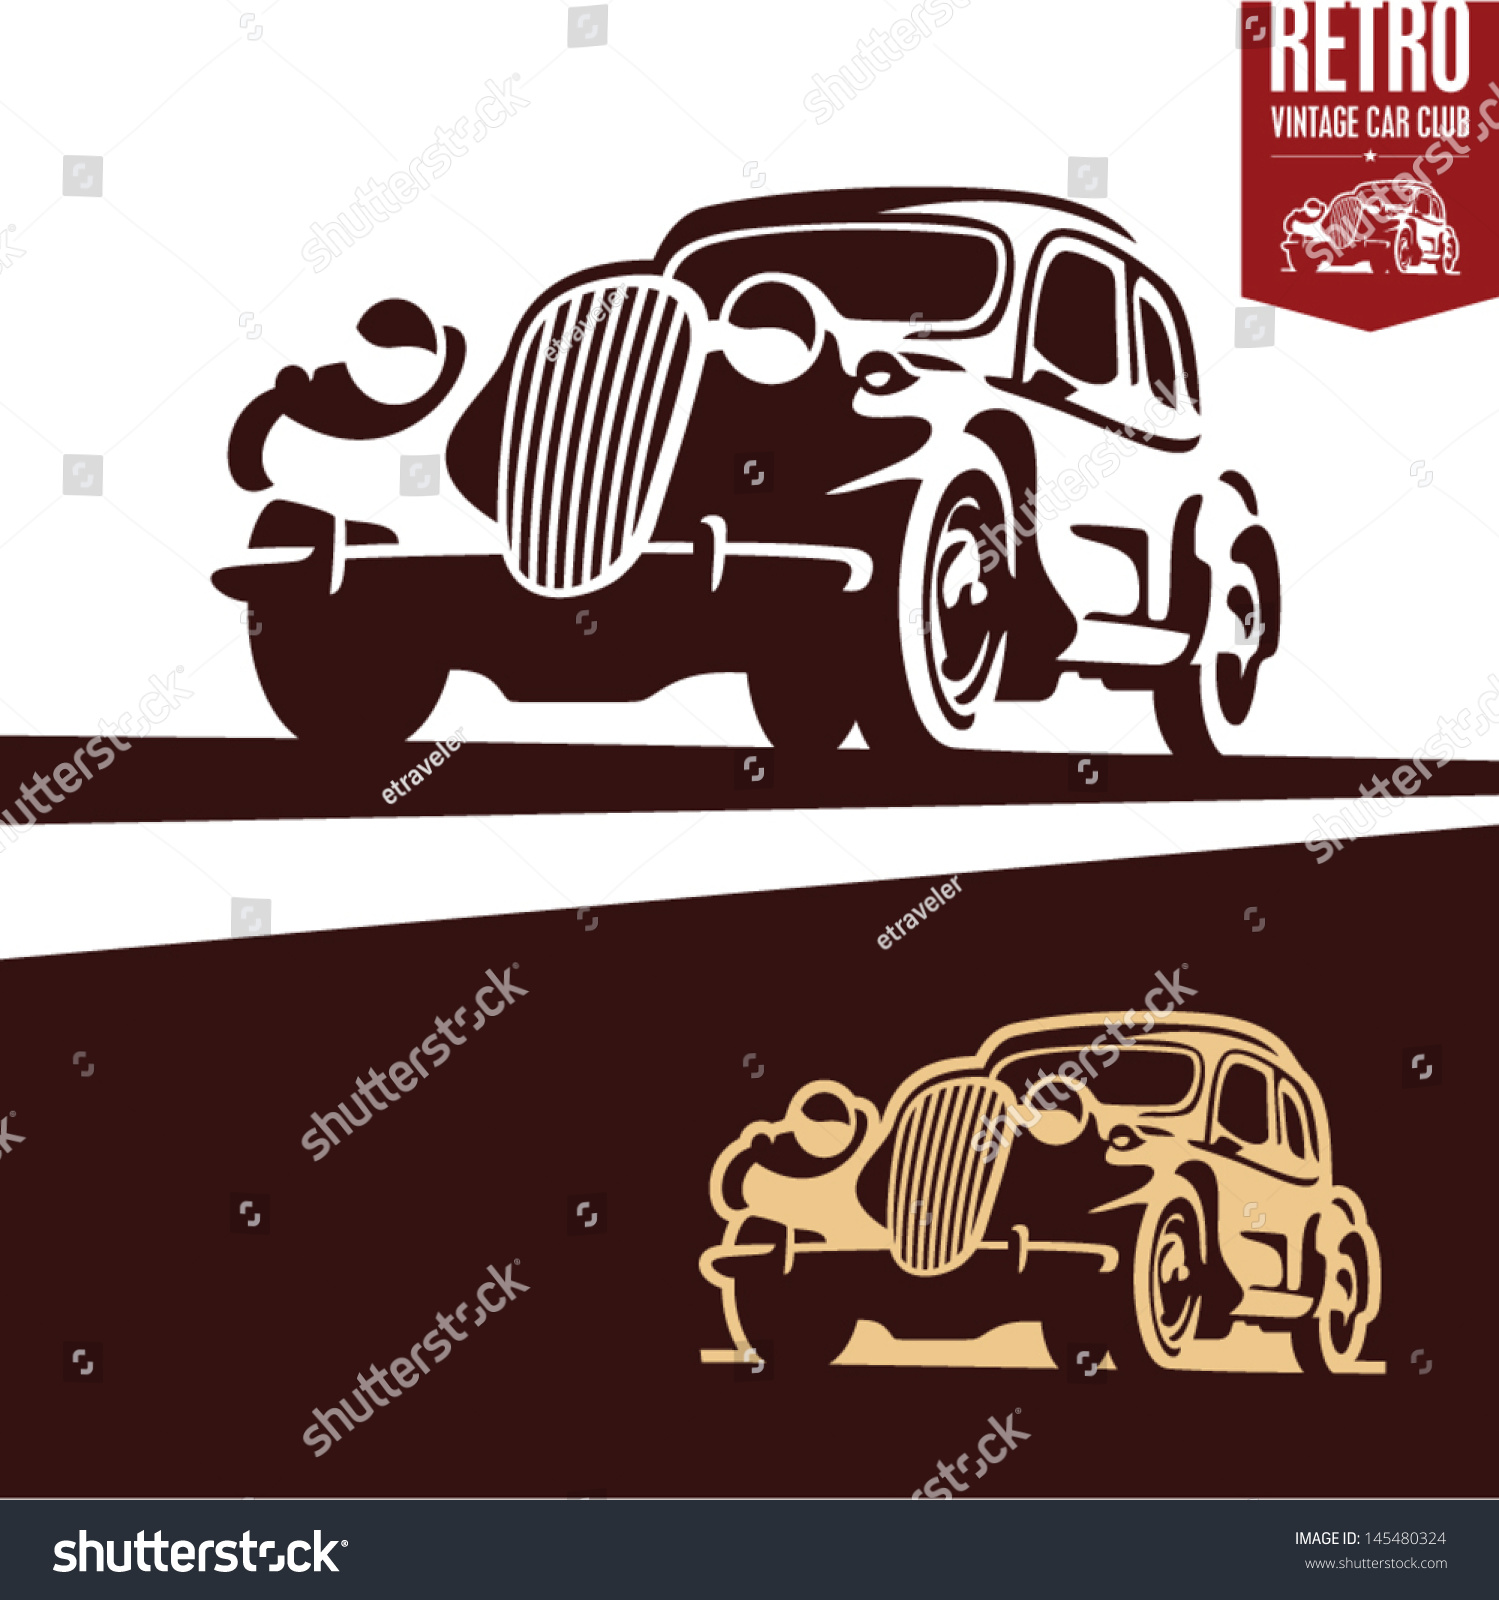 Значка для ретро автомобили 2